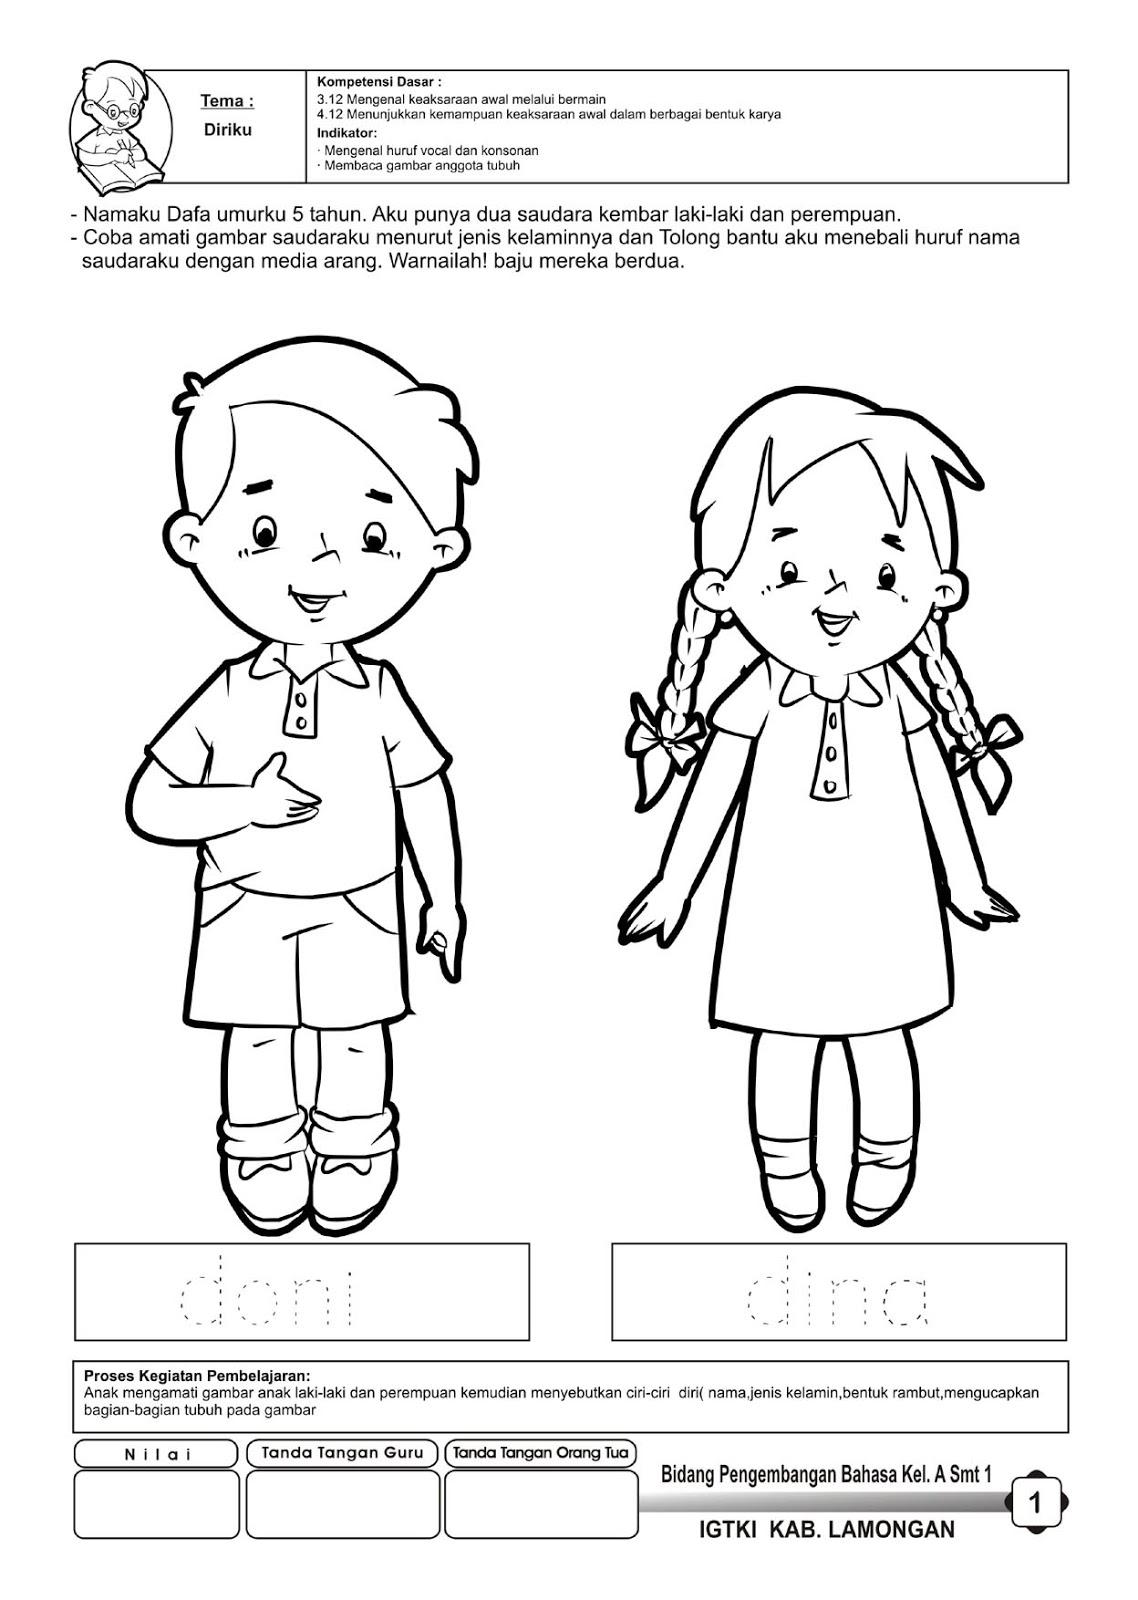 Worksheet Tk Tema Kendaraan Printable Worksheets And Activities For Teachers Parents Tutors And Homeschool Families